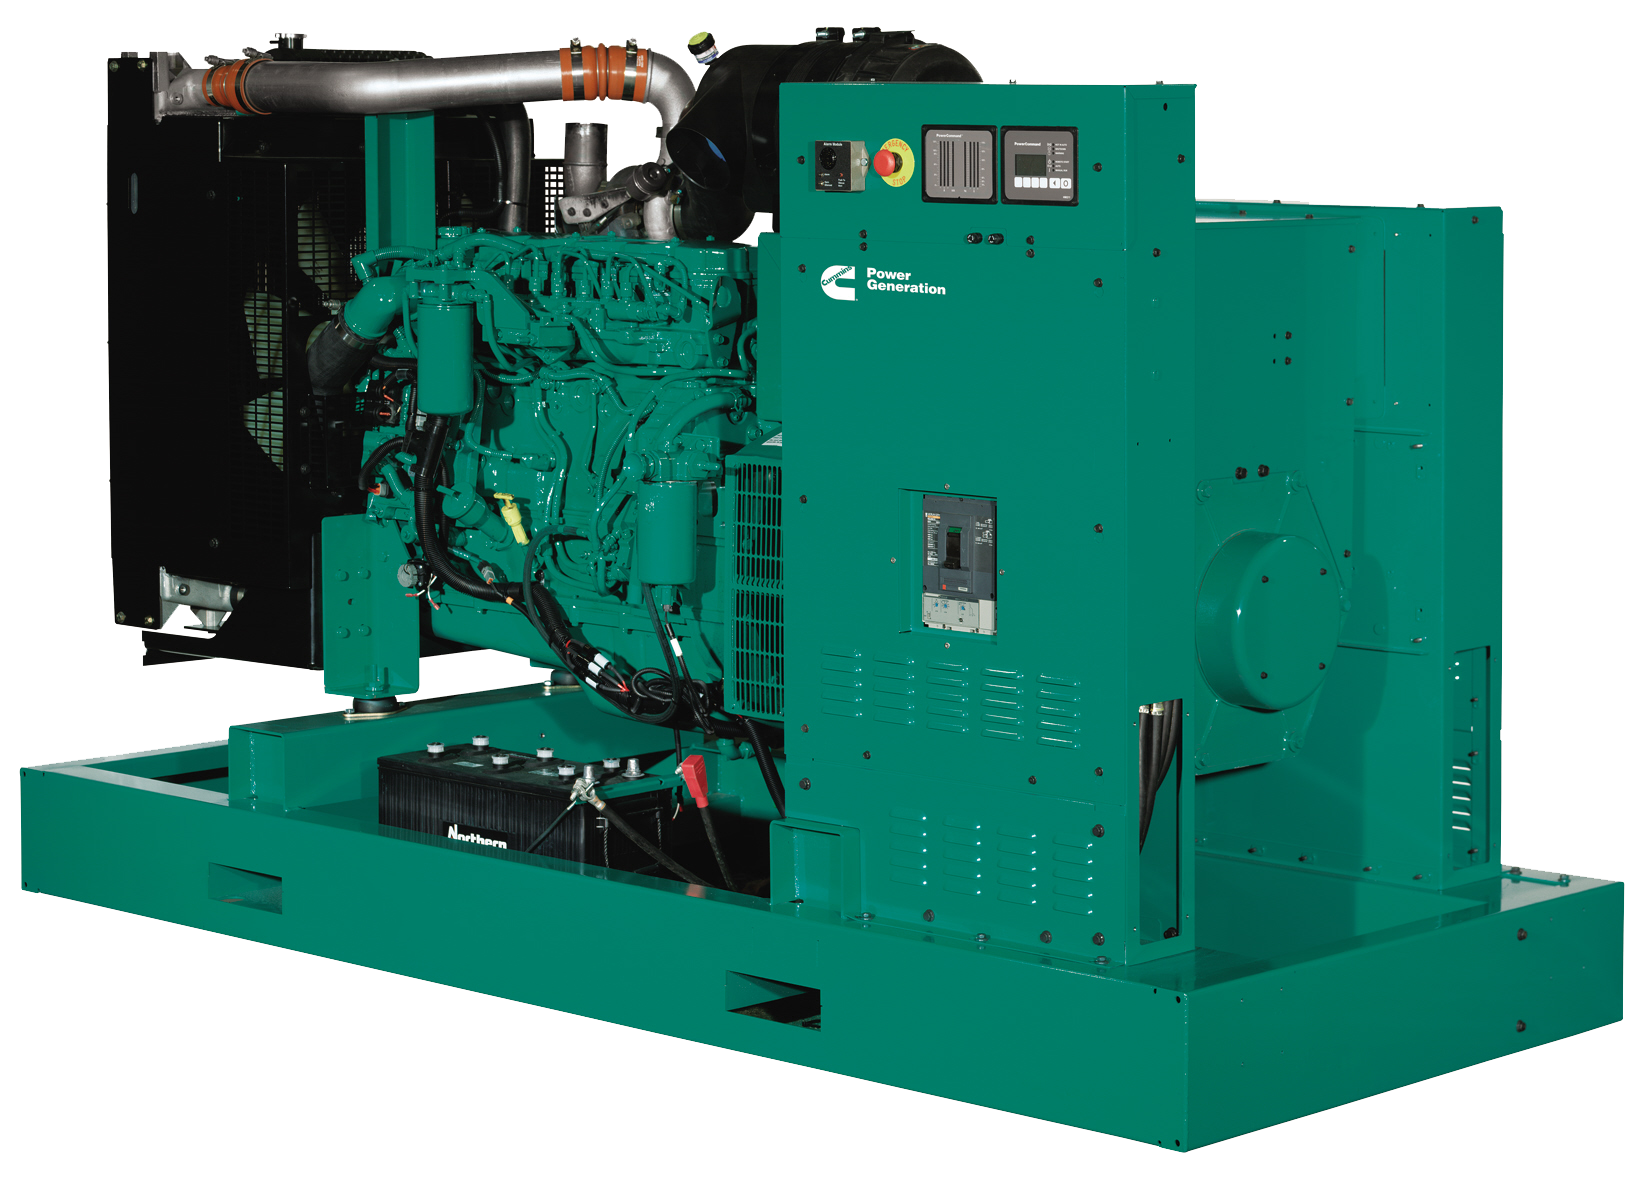 Cummins-375-kVA-Generator-Norwerk